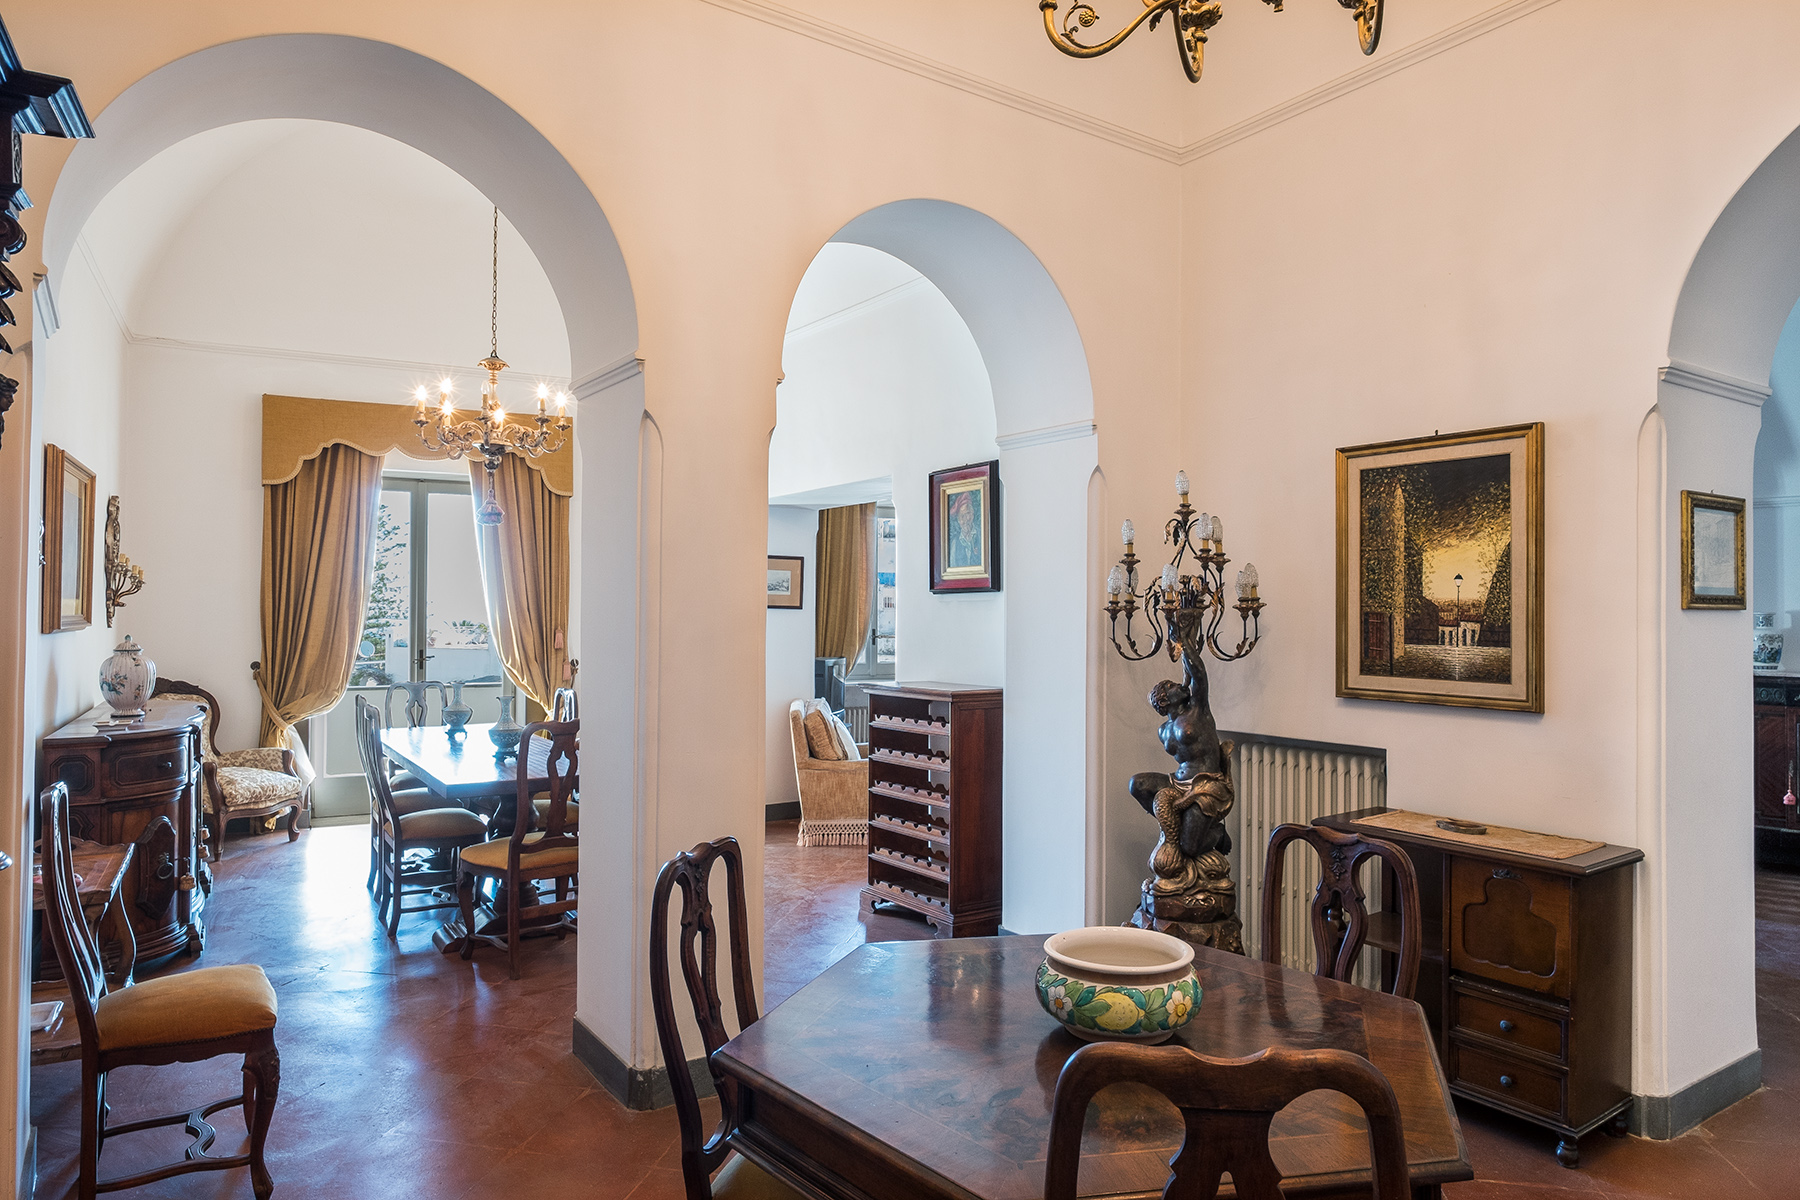 Casa indipendente in Vendita a Capri: 5 locali, 400 mq - Foto 3